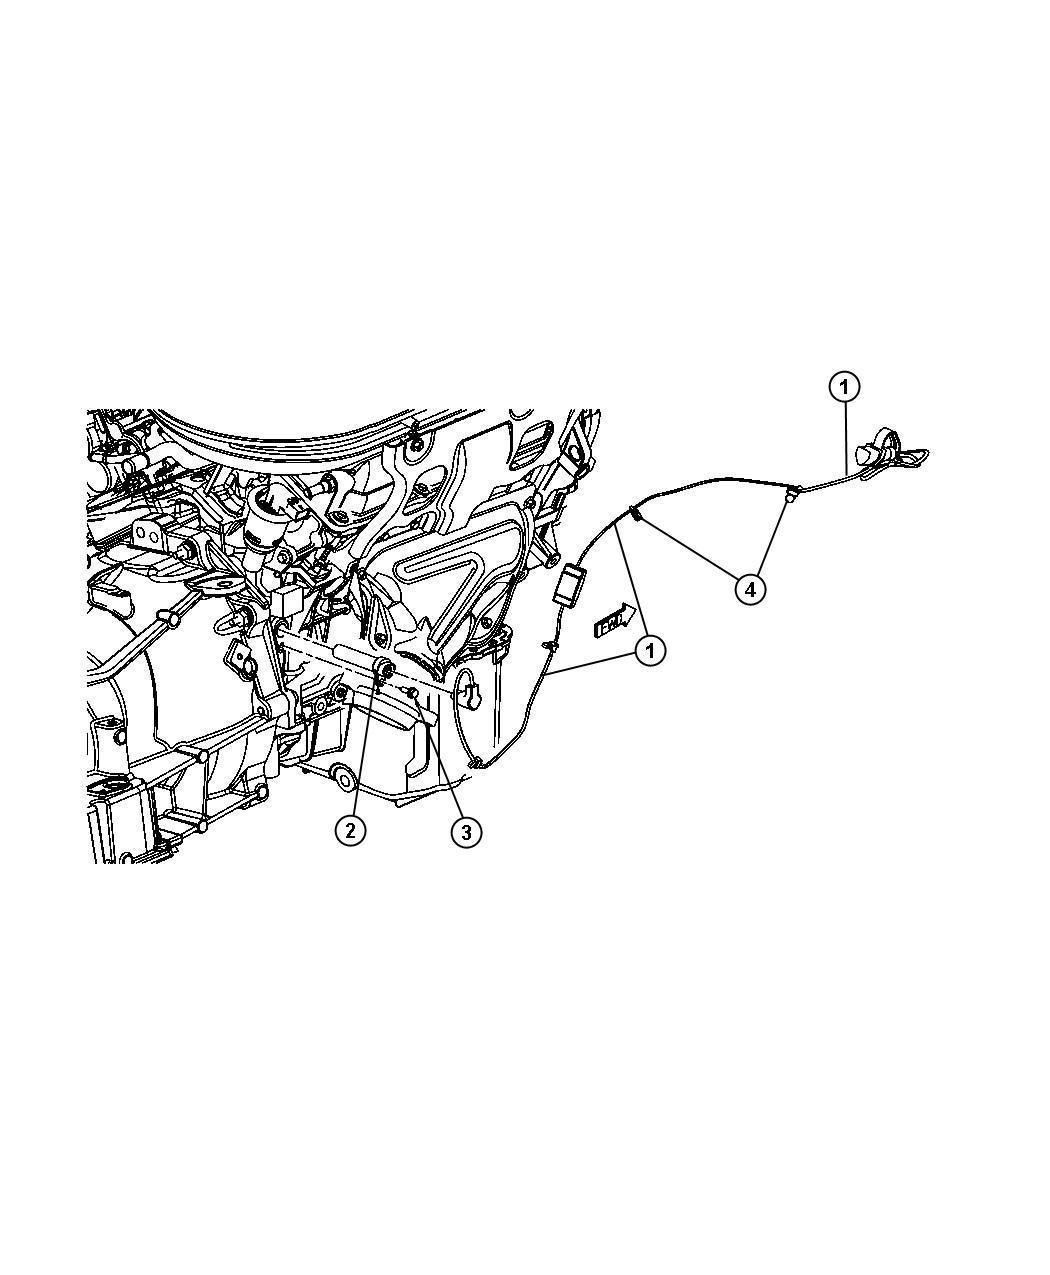 Dodge Express Cord Engine Block Heater 2 4l 4 Cyl